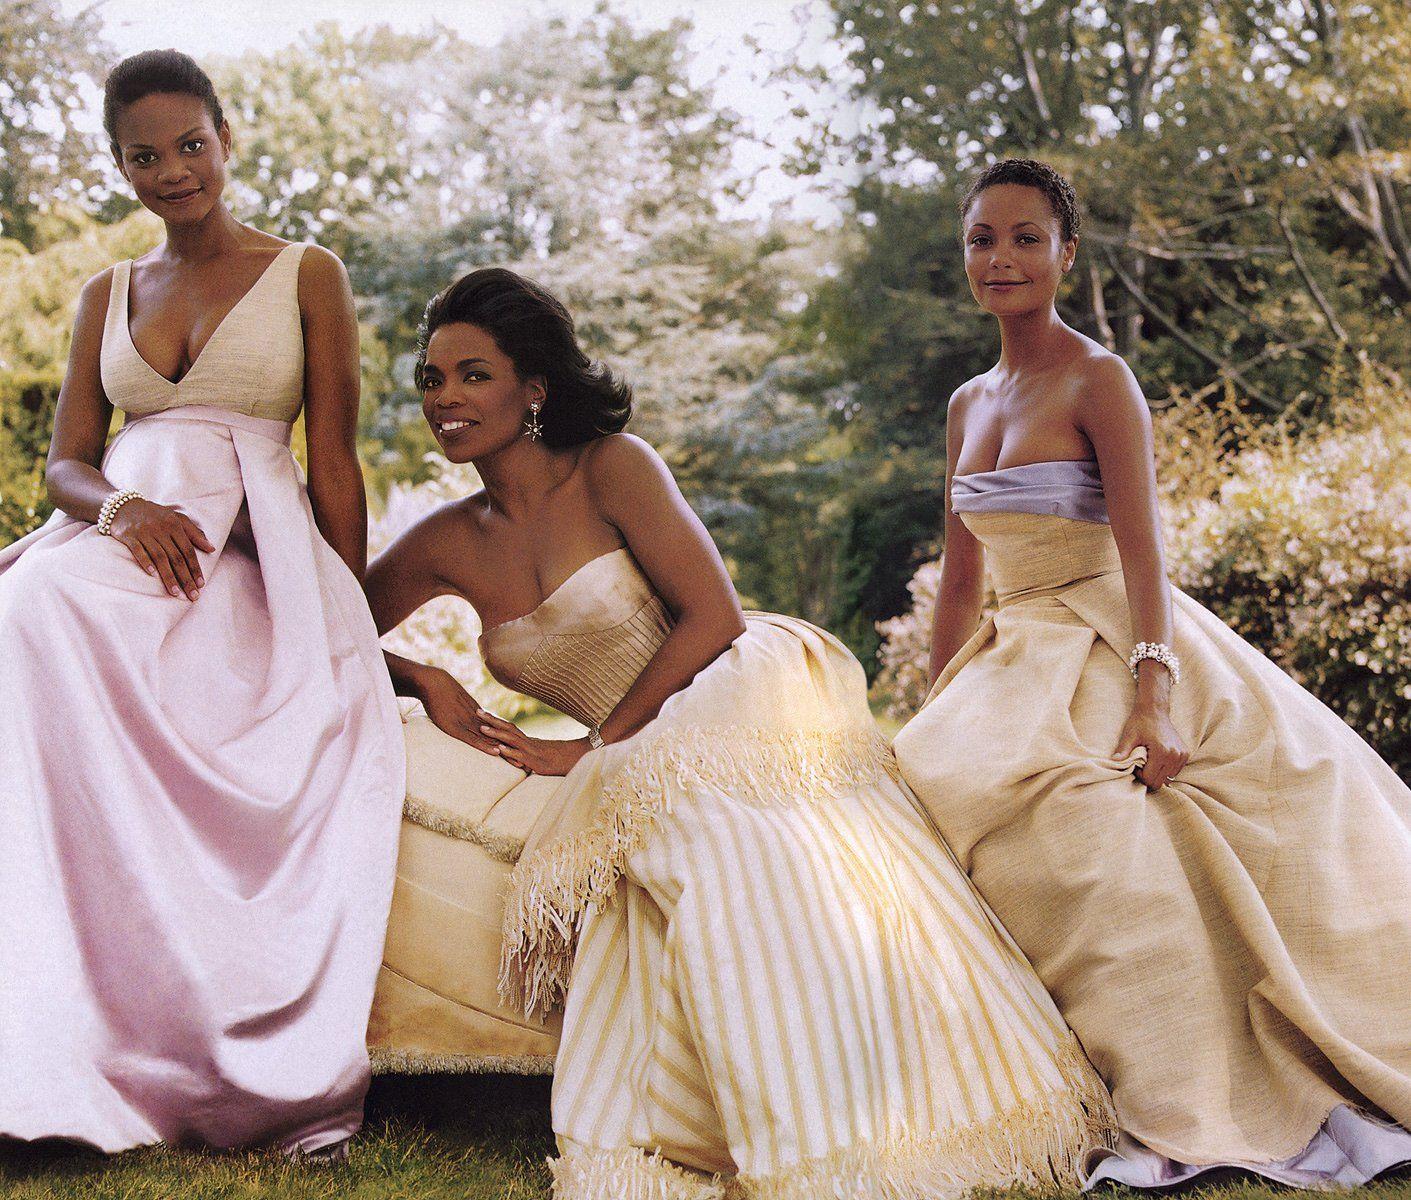 BELOVED WOMEN - From left: Kimberly Elise in an Isaac Mizrahi dress ...